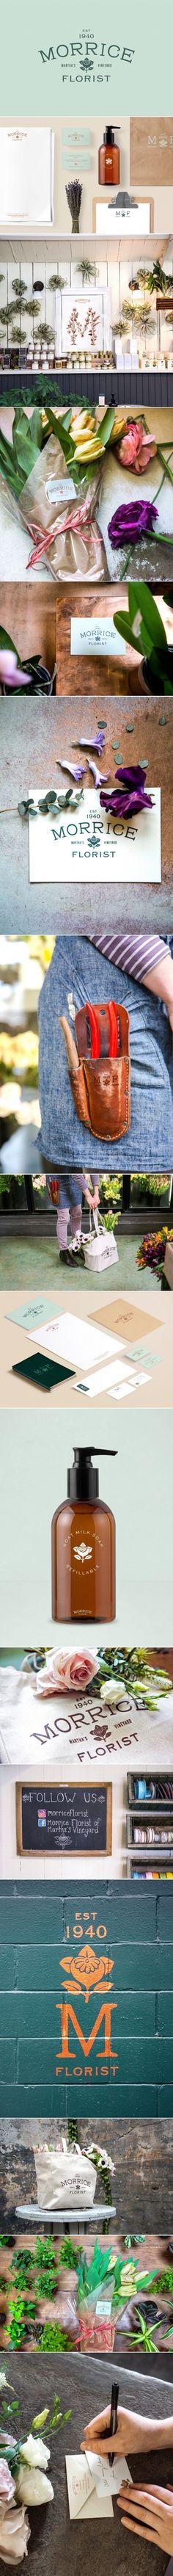 Morrice Florist: Branding by Bluerock Design.